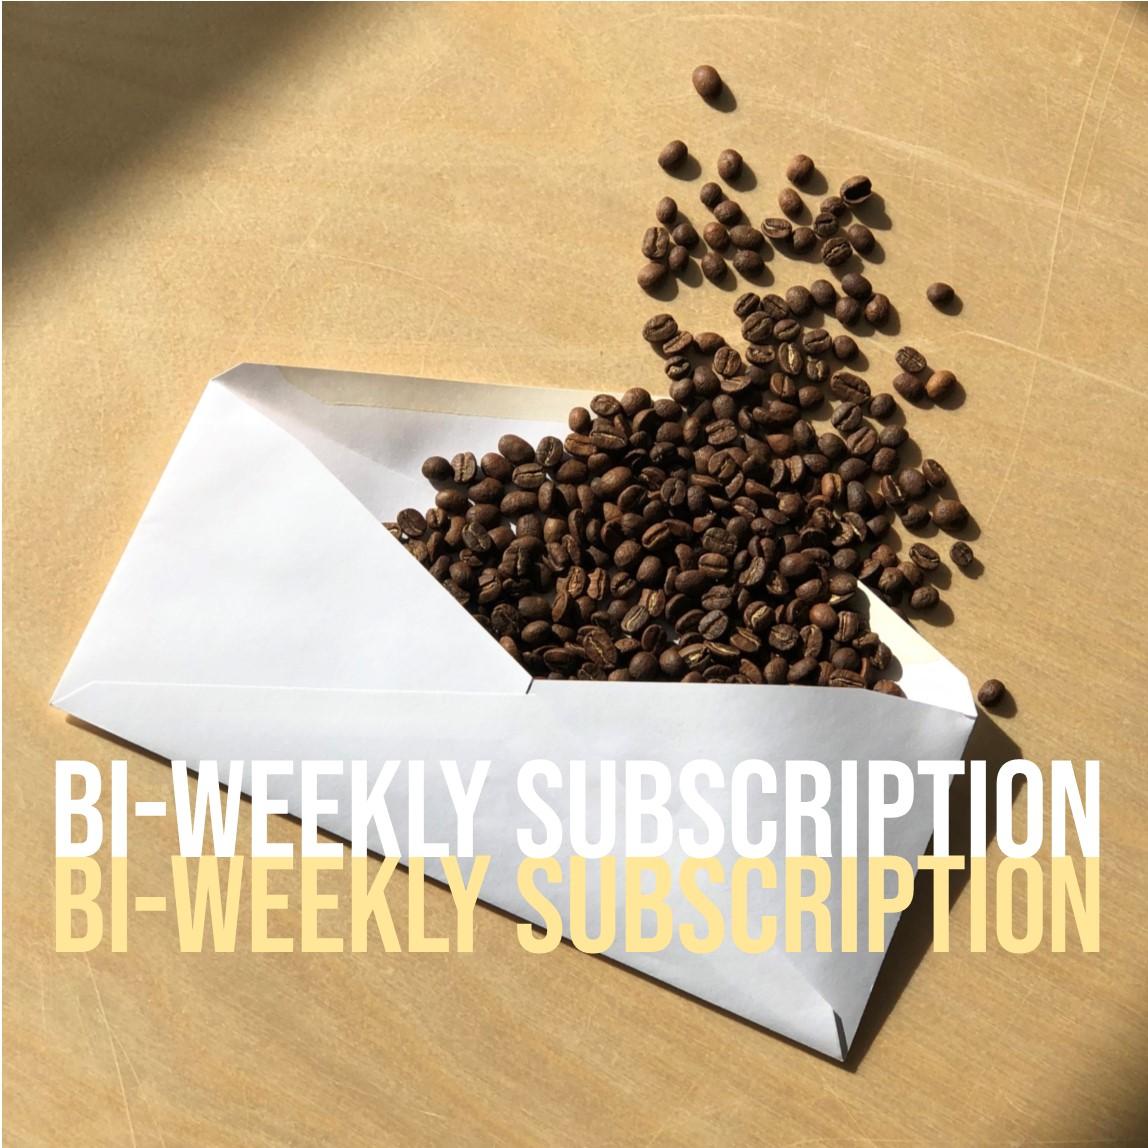 biweekly_subscription_image.jpg